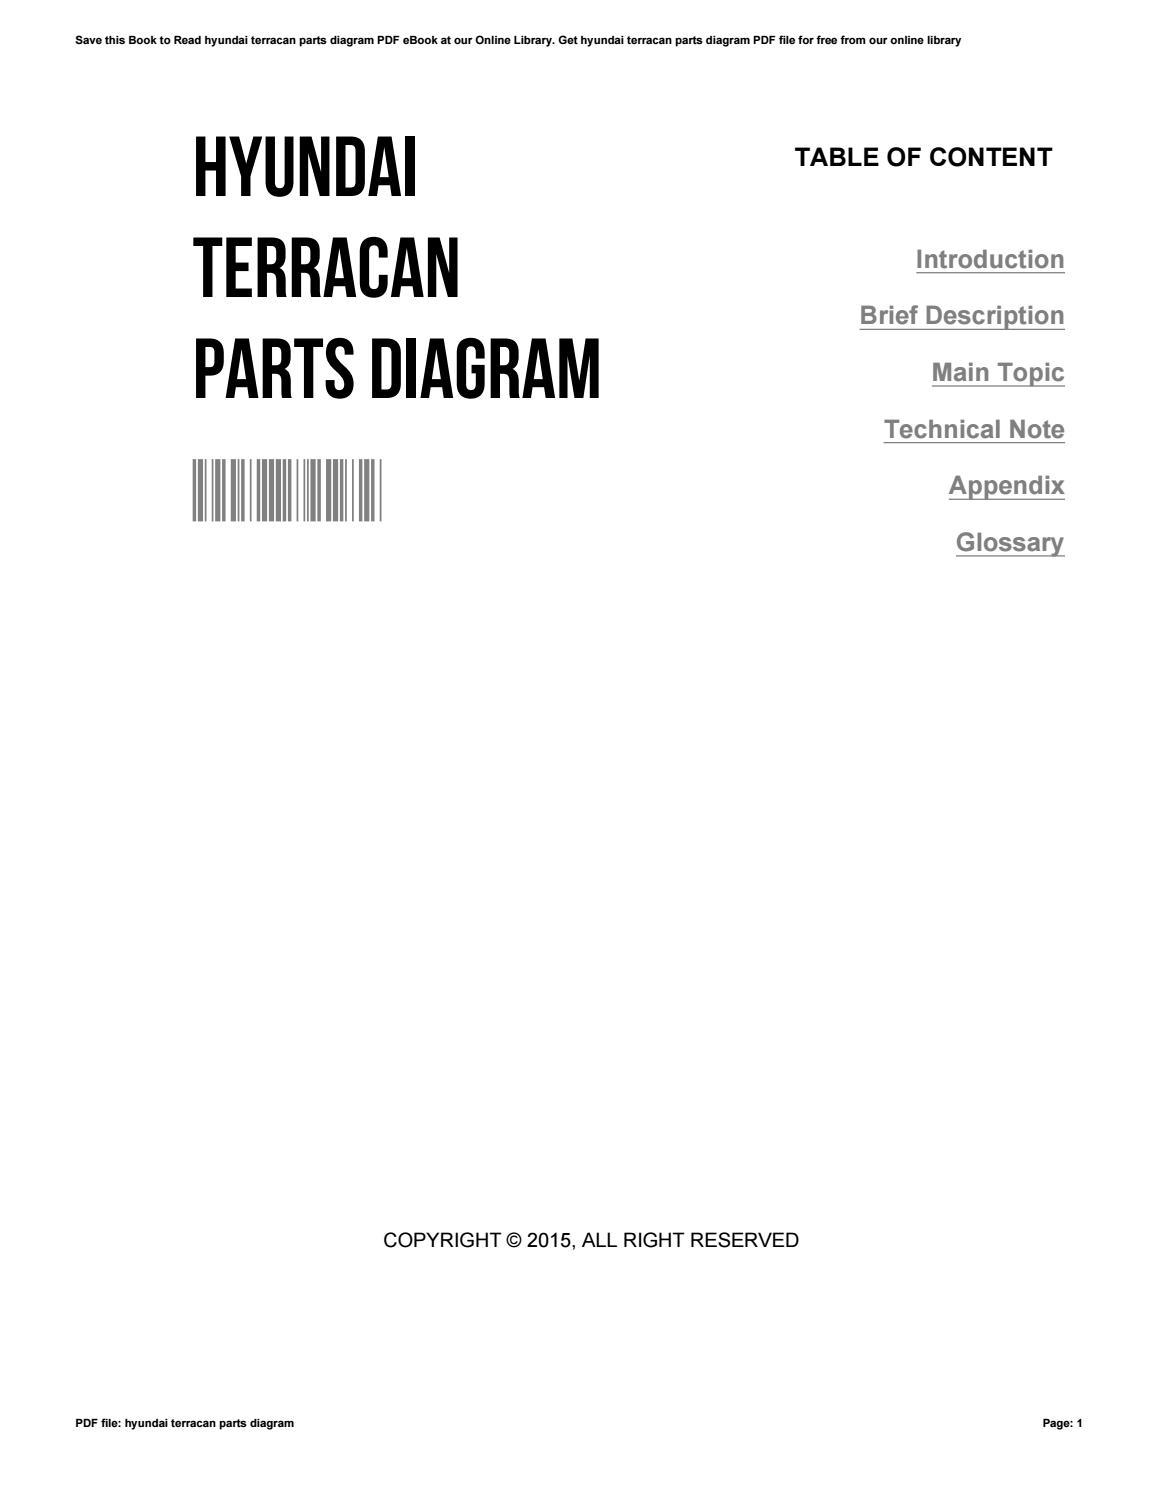 Hyundai Terracan Parts Diagram By Danielturley2537